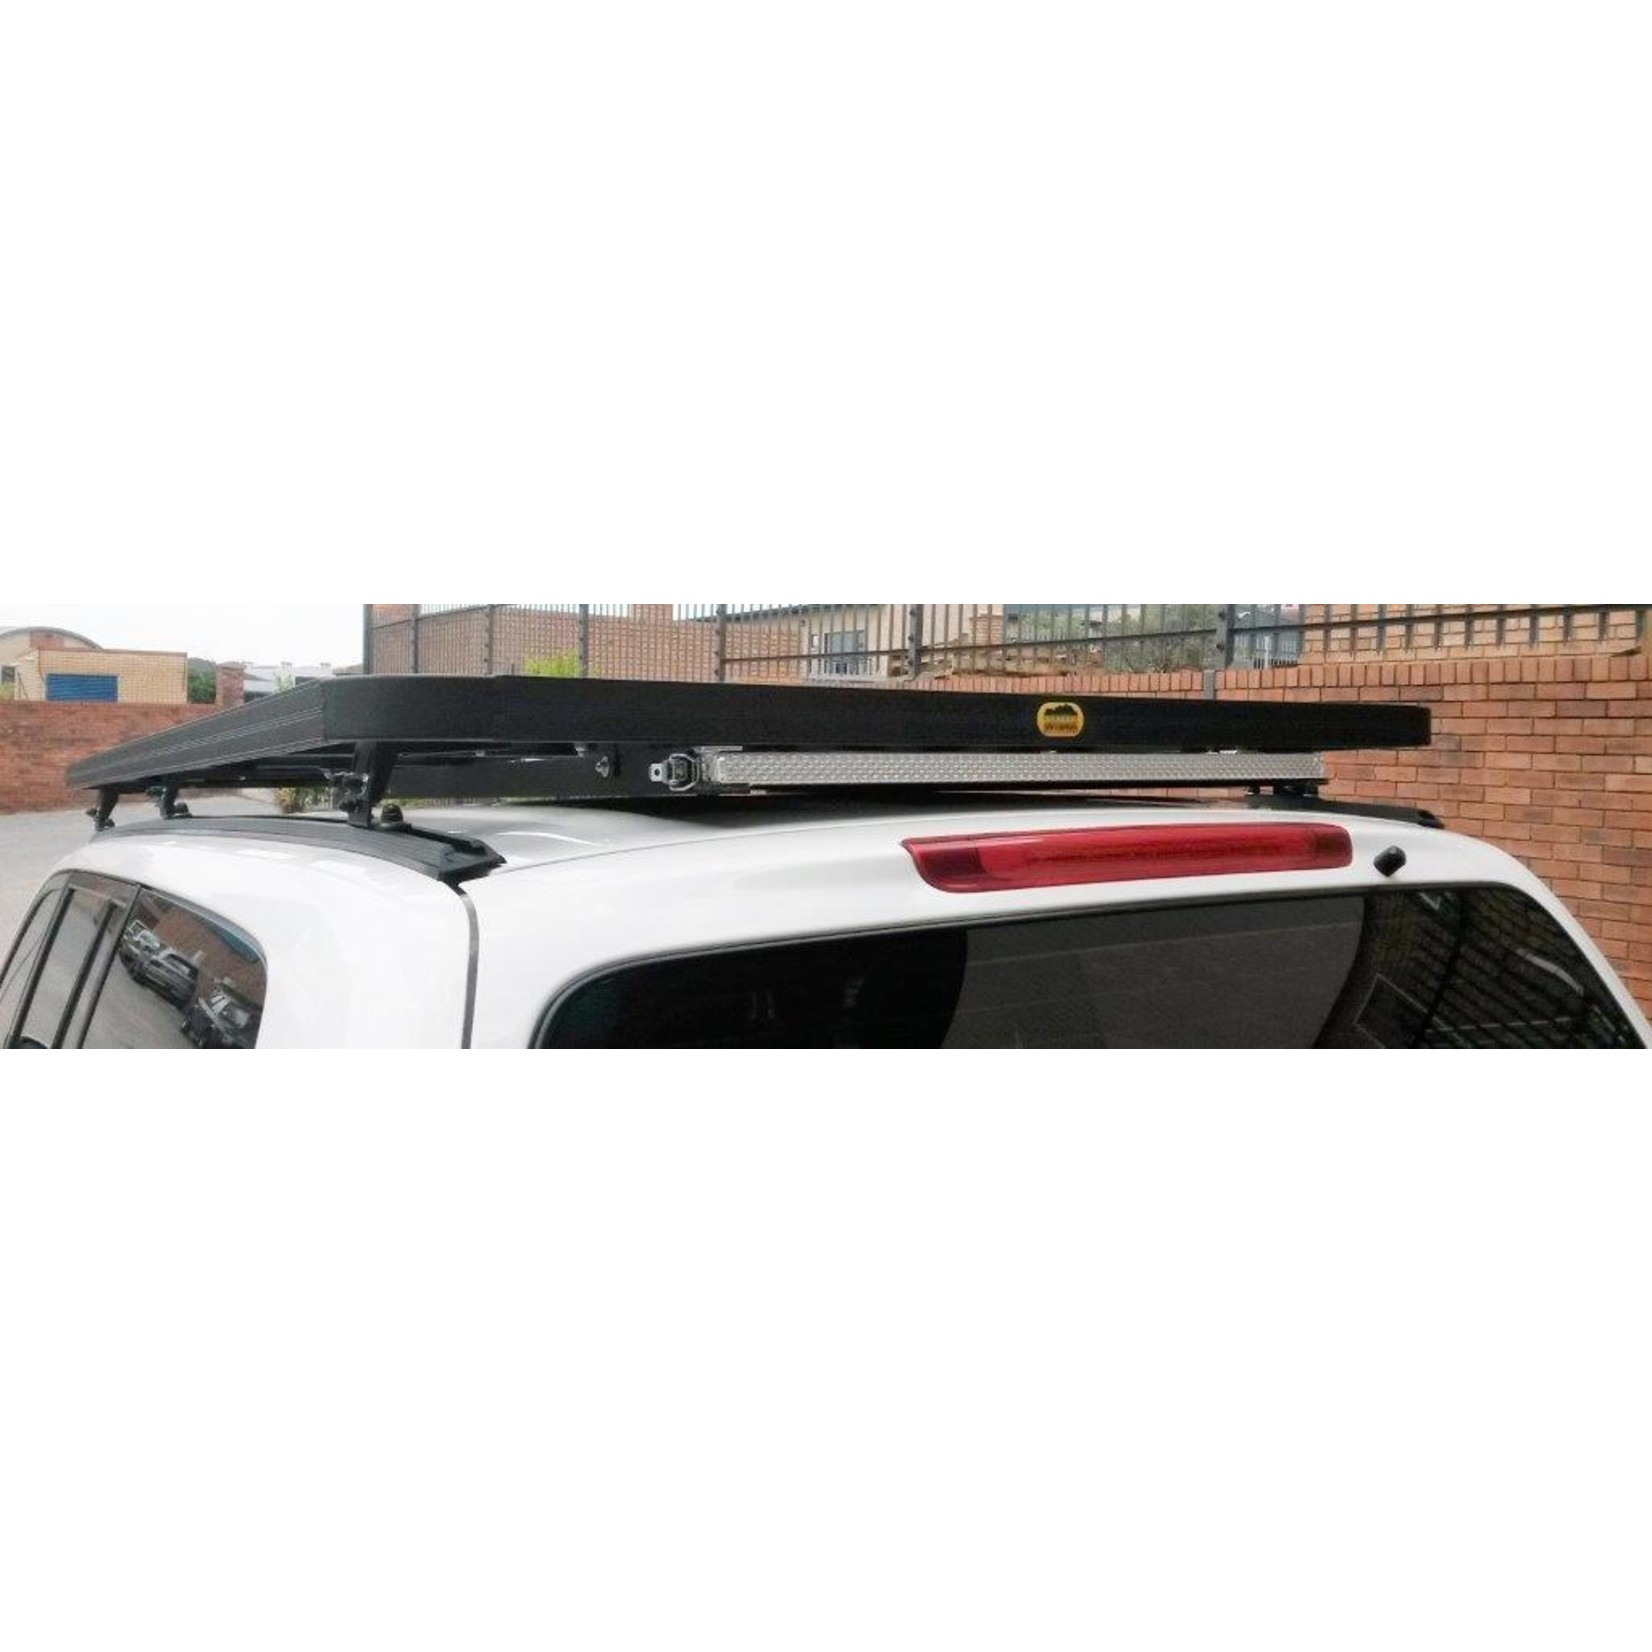 Big Country 4x4 Big Country 4x4 Lexus GX 470 Roof Rack